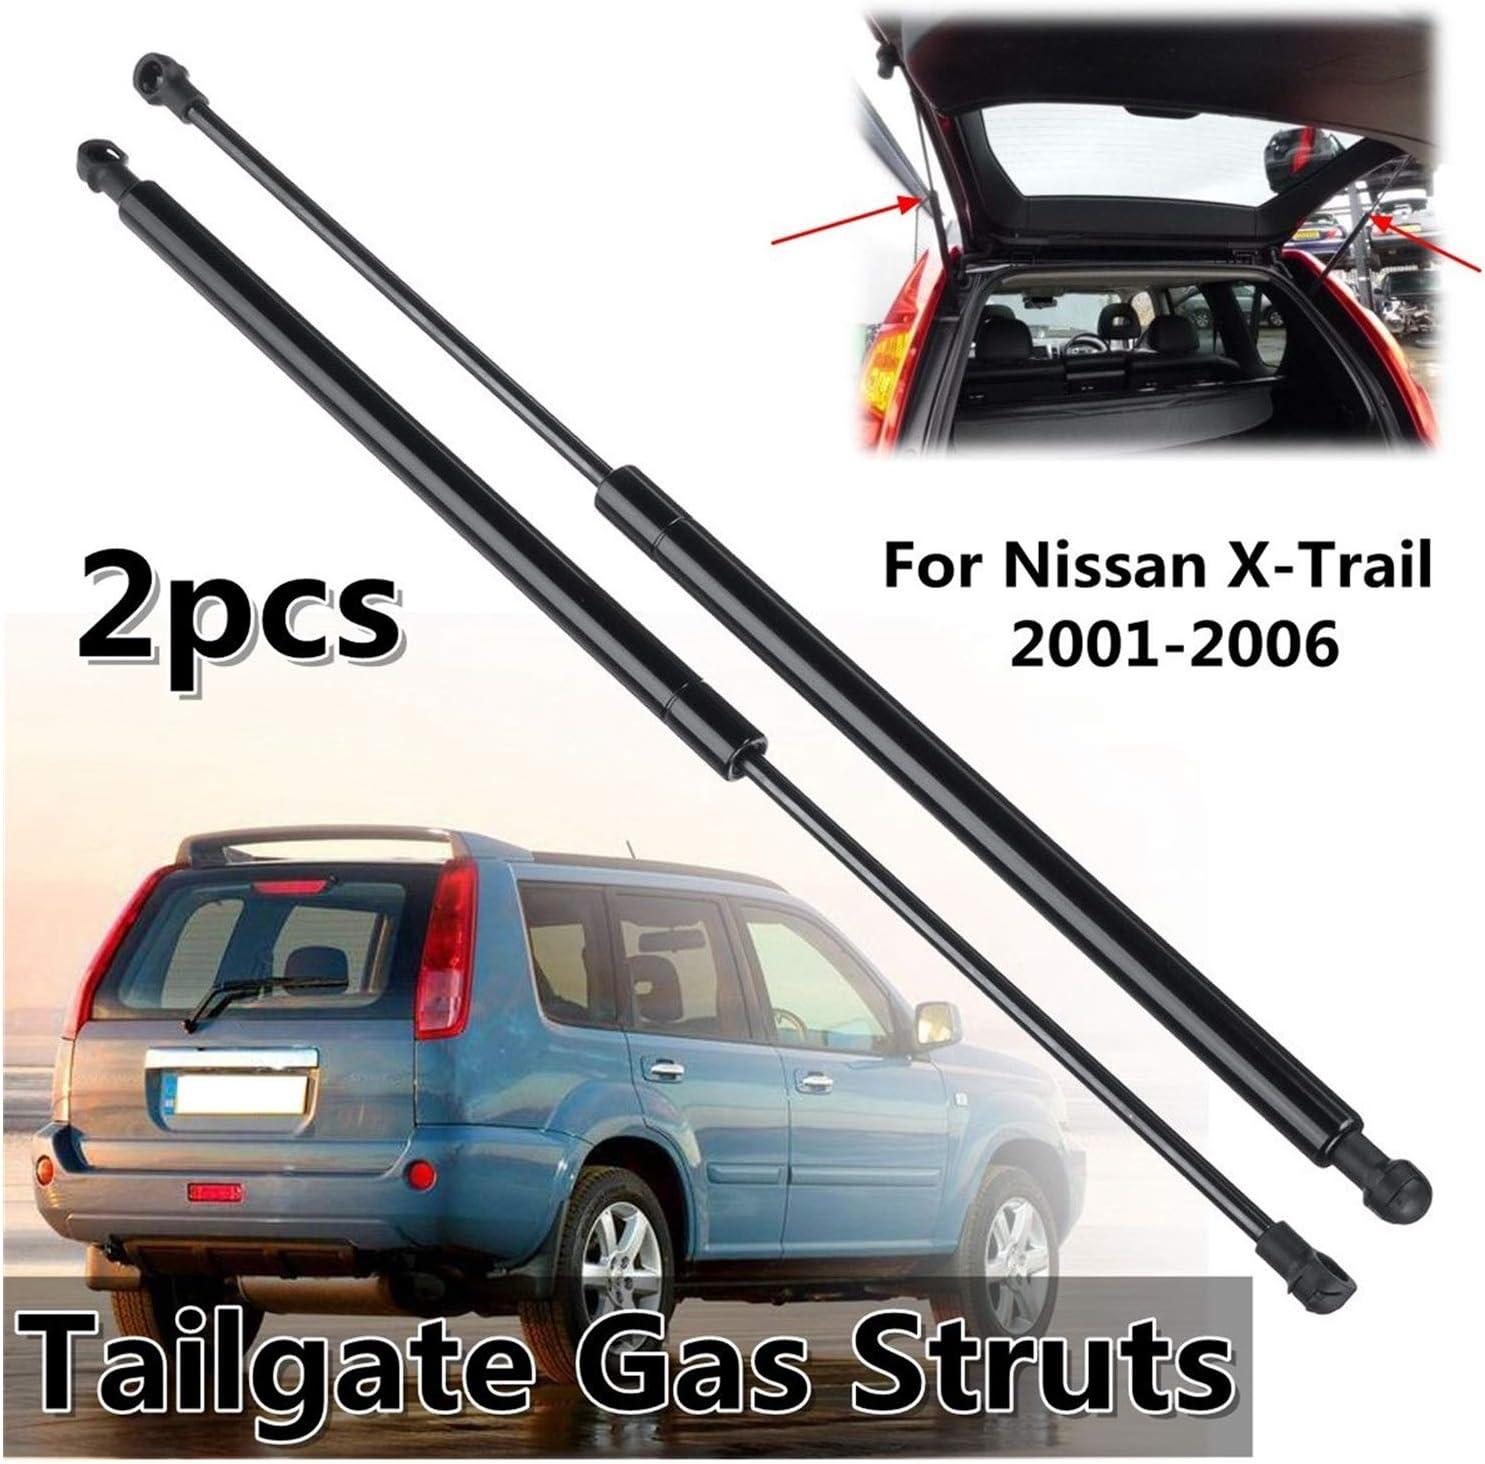 WRDD Lift Support Struts for Under Ranking TOP1 blast sales Nissan 2001-2006 90450-8H31 X-Trail